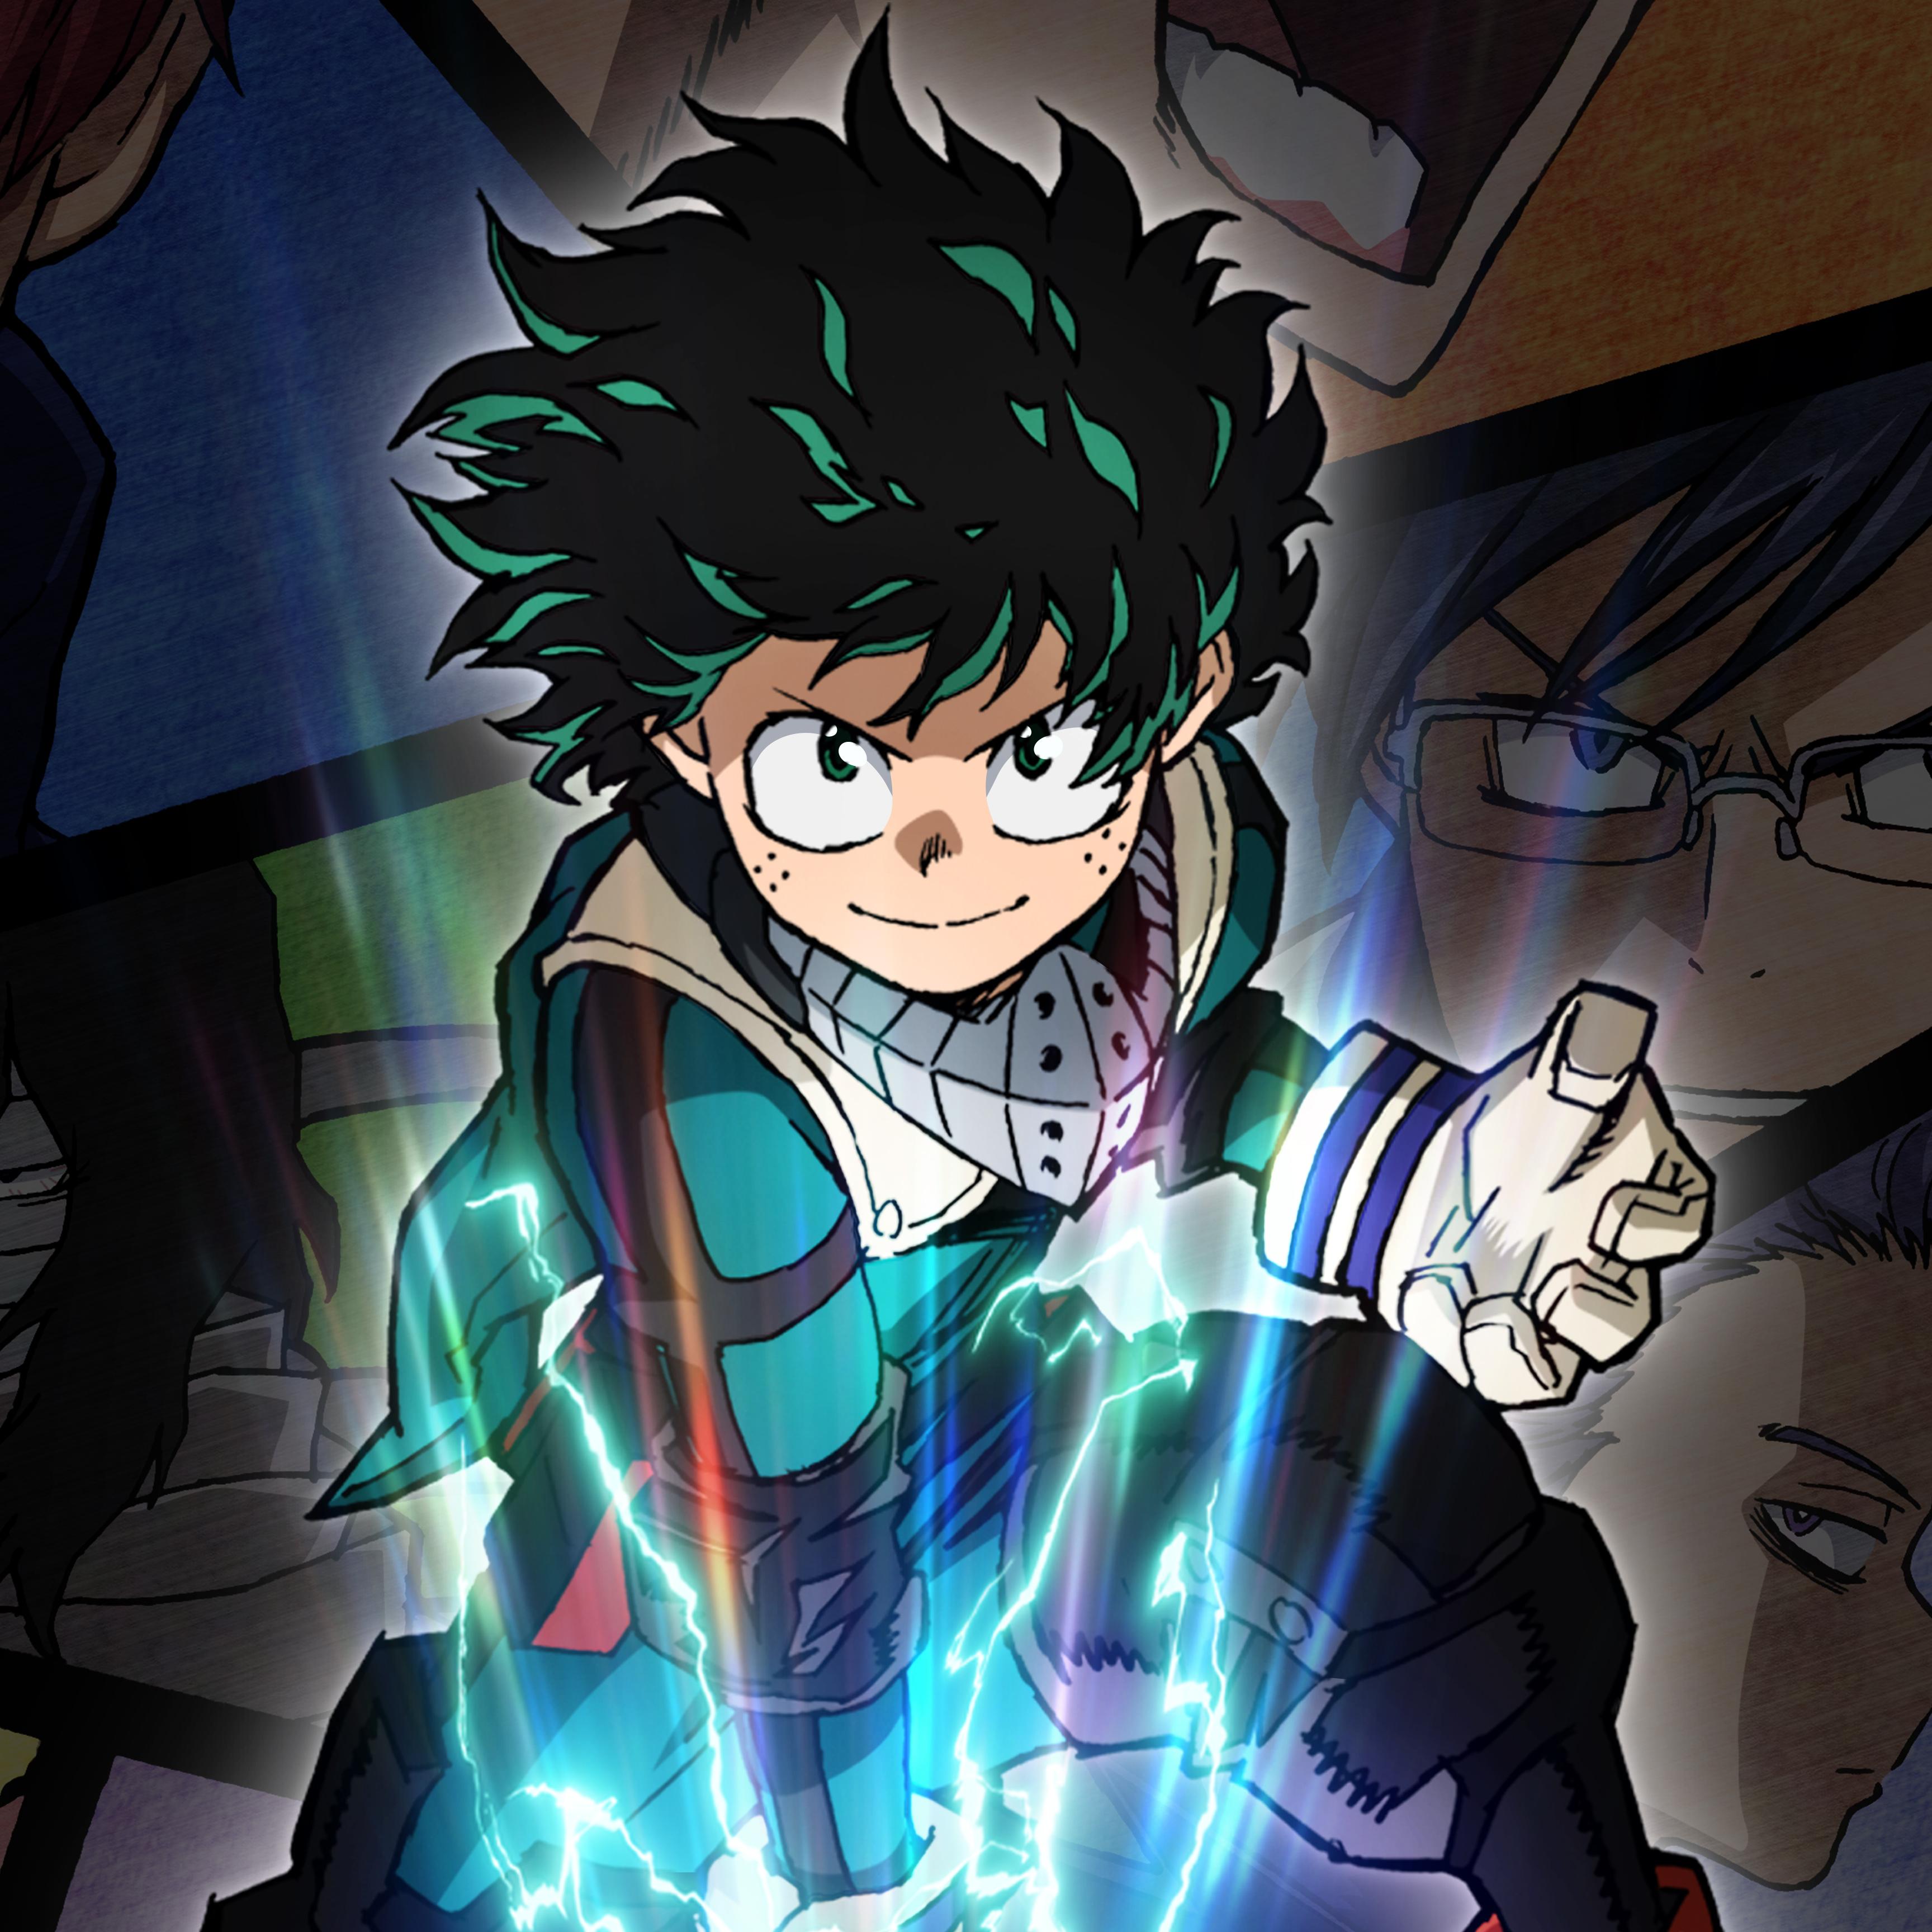 Watch my hero academia episodes sub dub action adventure shounen anime funimation